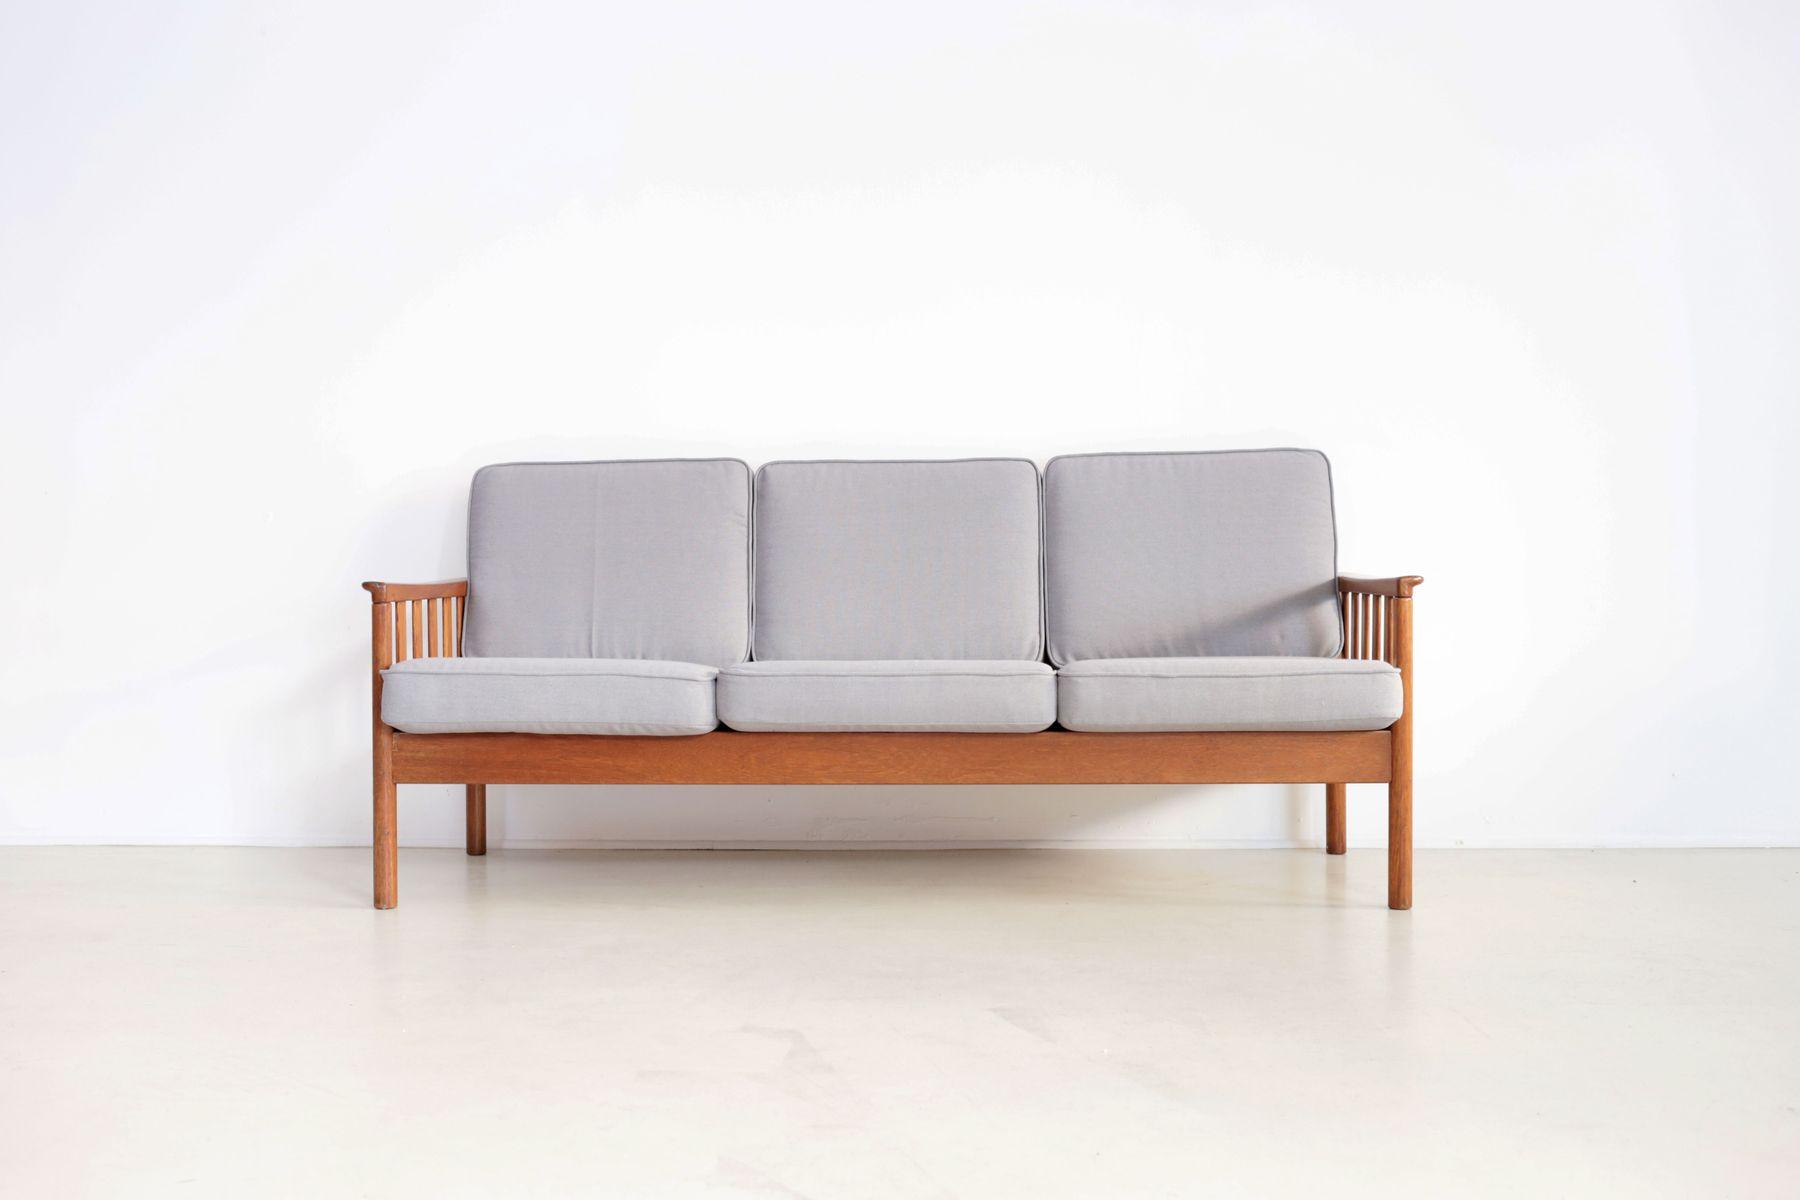 Scandinavian Teak Sofa Bench 1950s